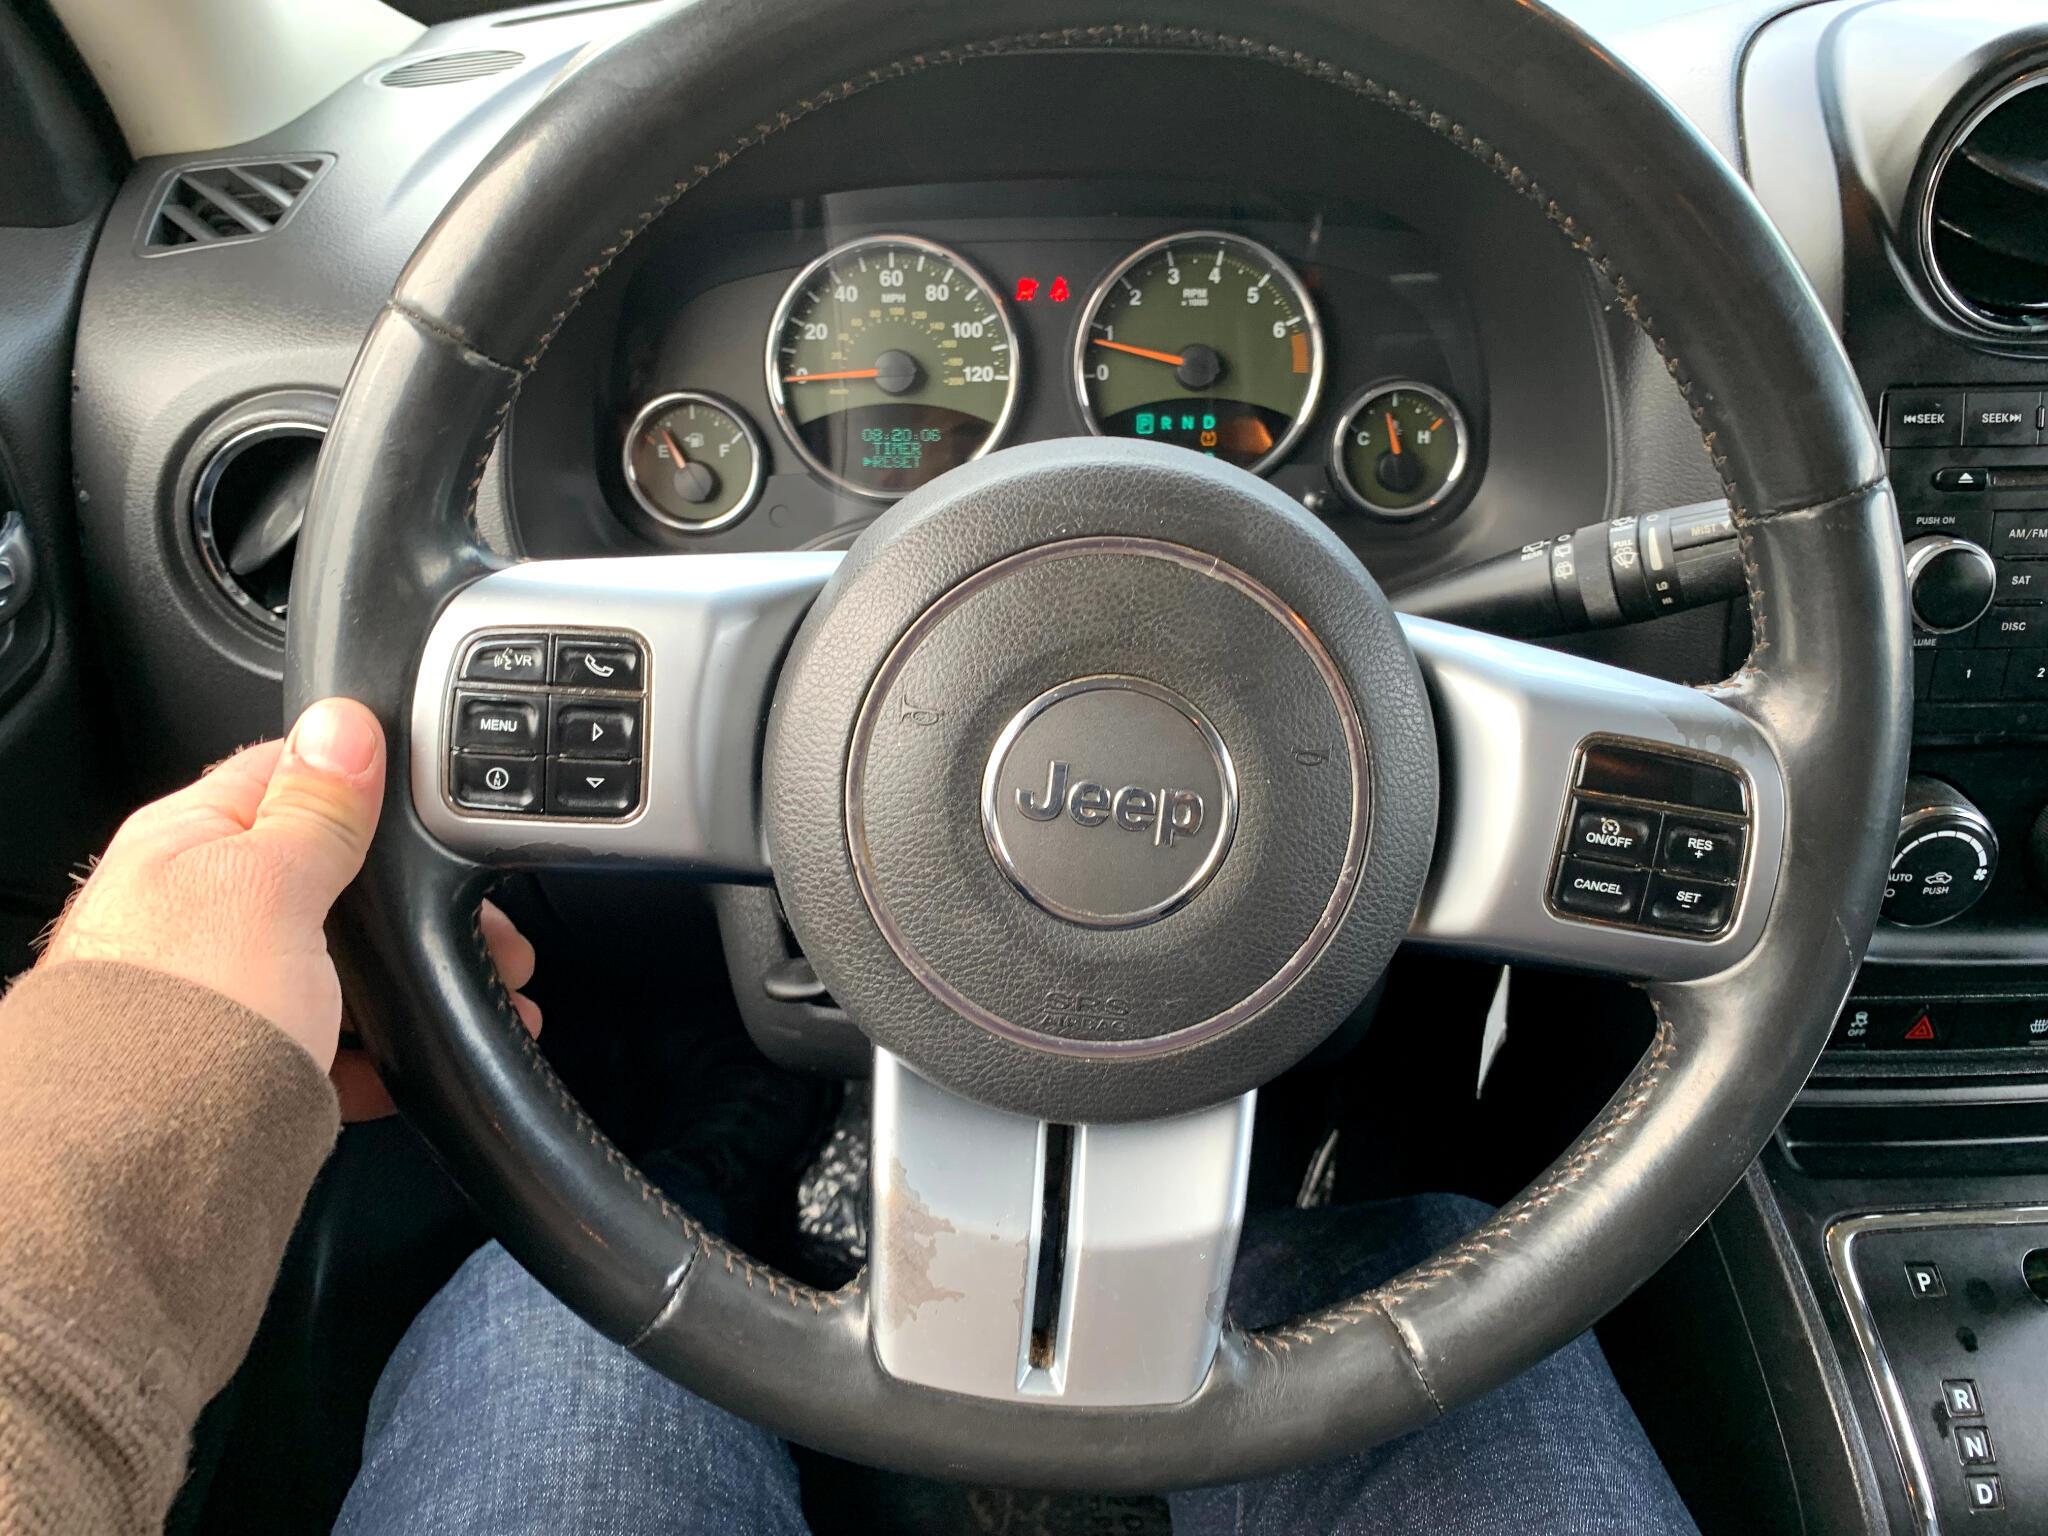 2011 Jeep Patriot FWD 4dr 70th Anniversary